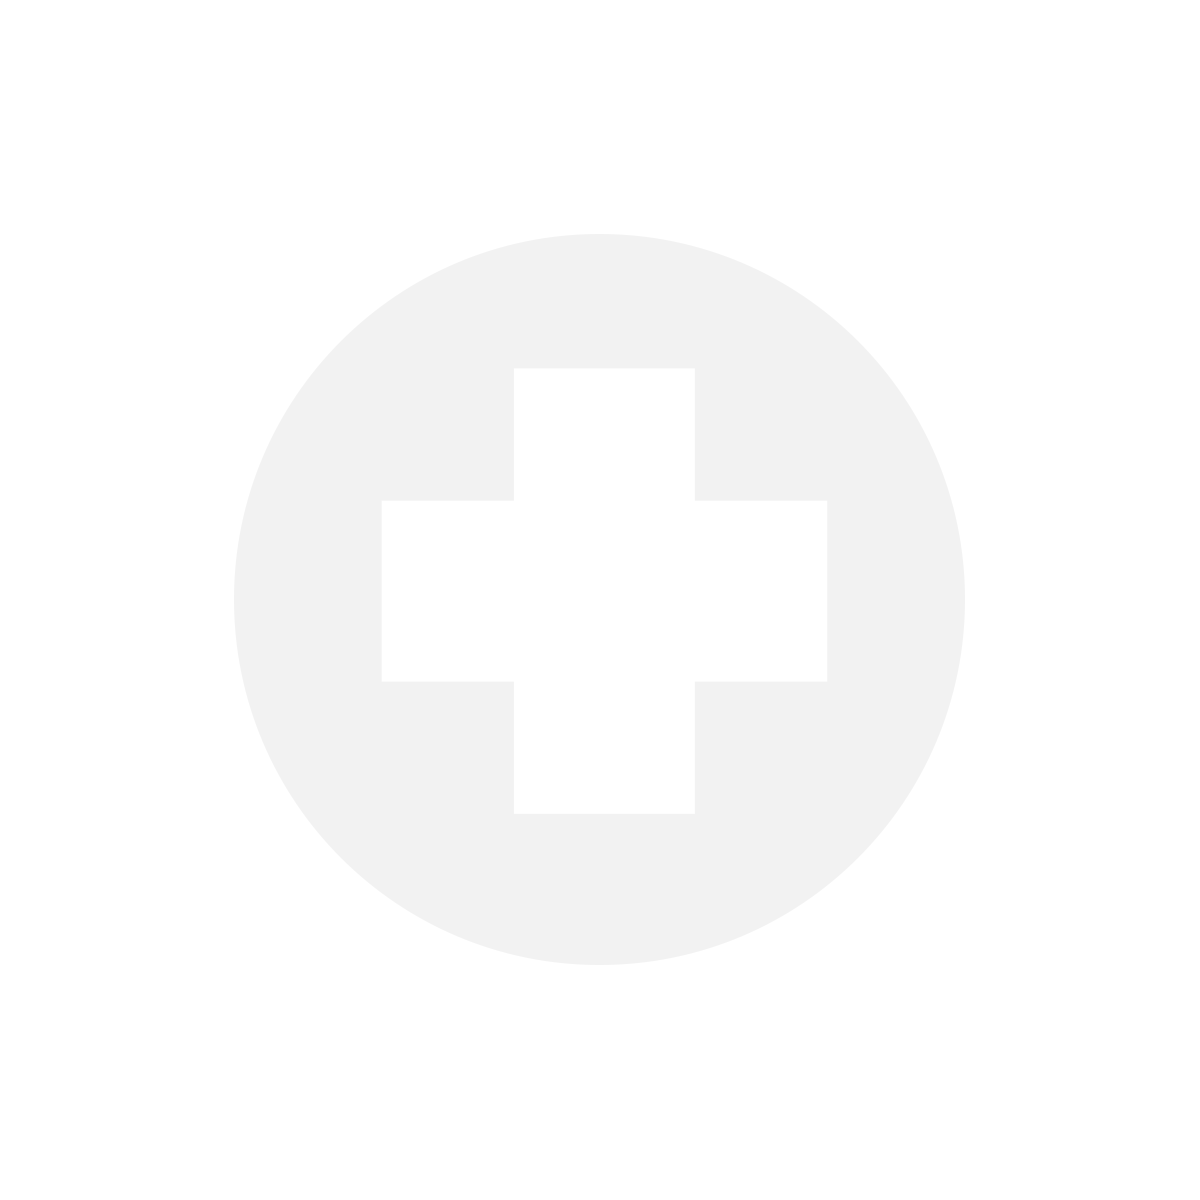 Sonde anale ANALYS+ - 2 Barrettes